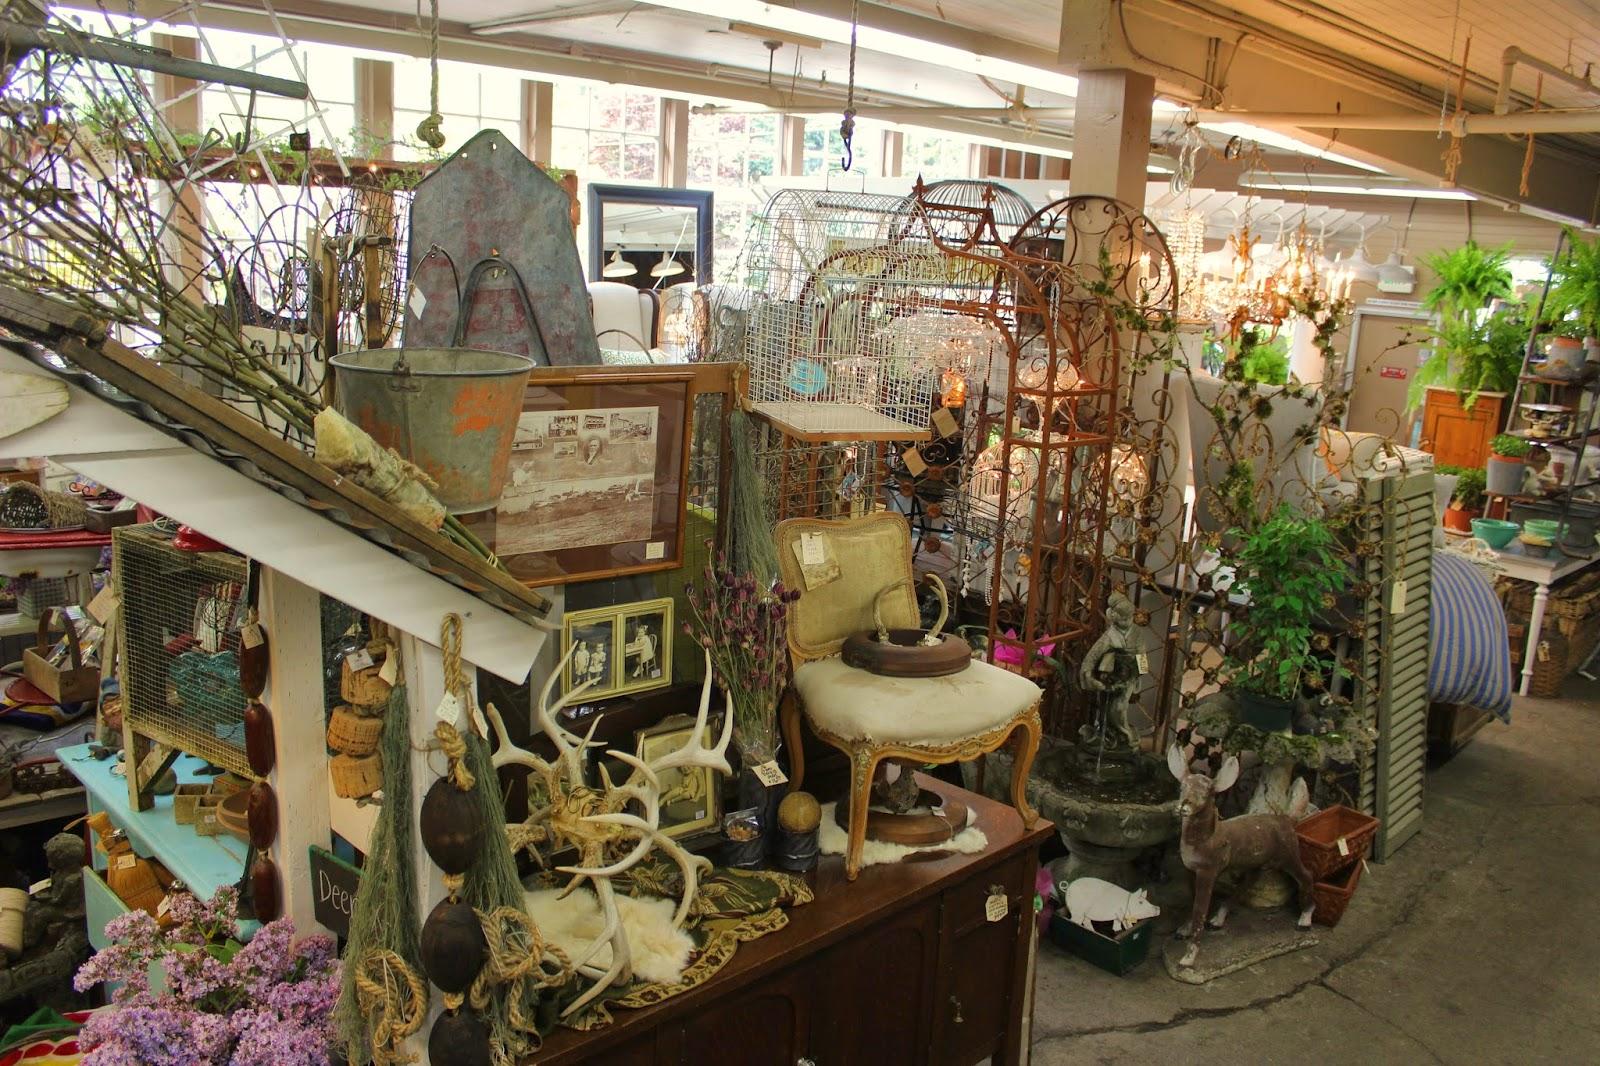 Monticello Antique Marketplace Outdoor Living